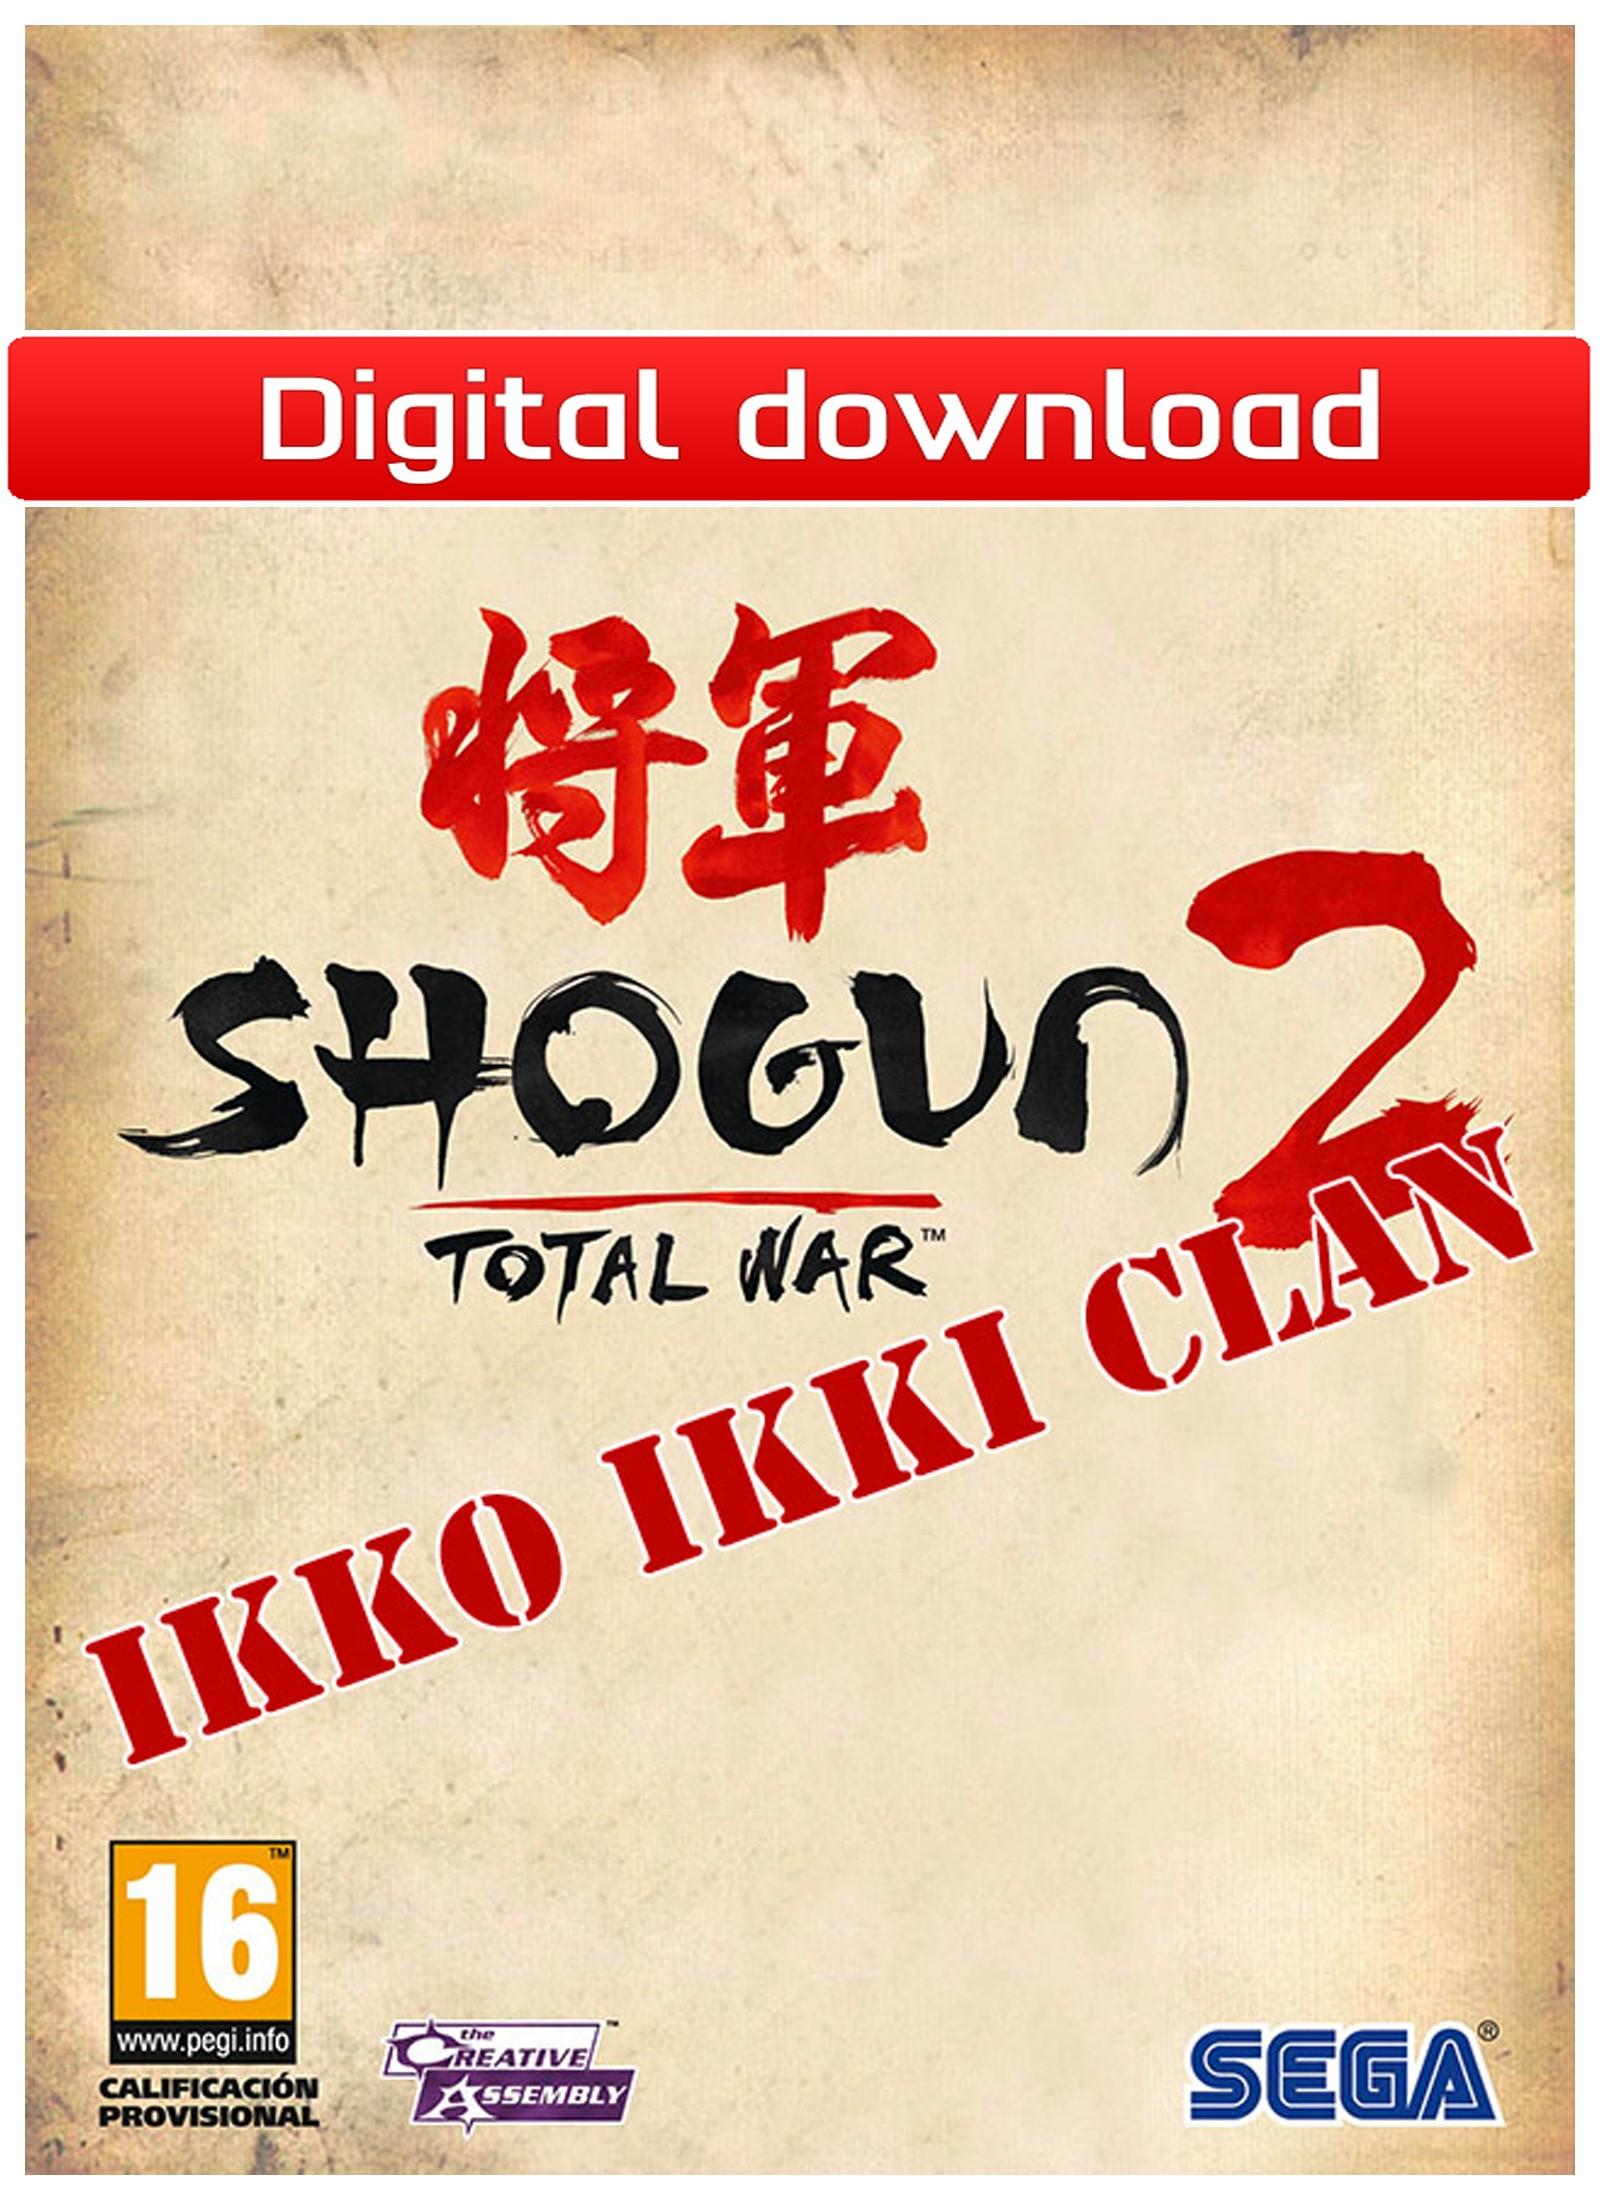 26272 : Total War: Shogun 2: Ikko Ikki Clan (PC nedlastning)